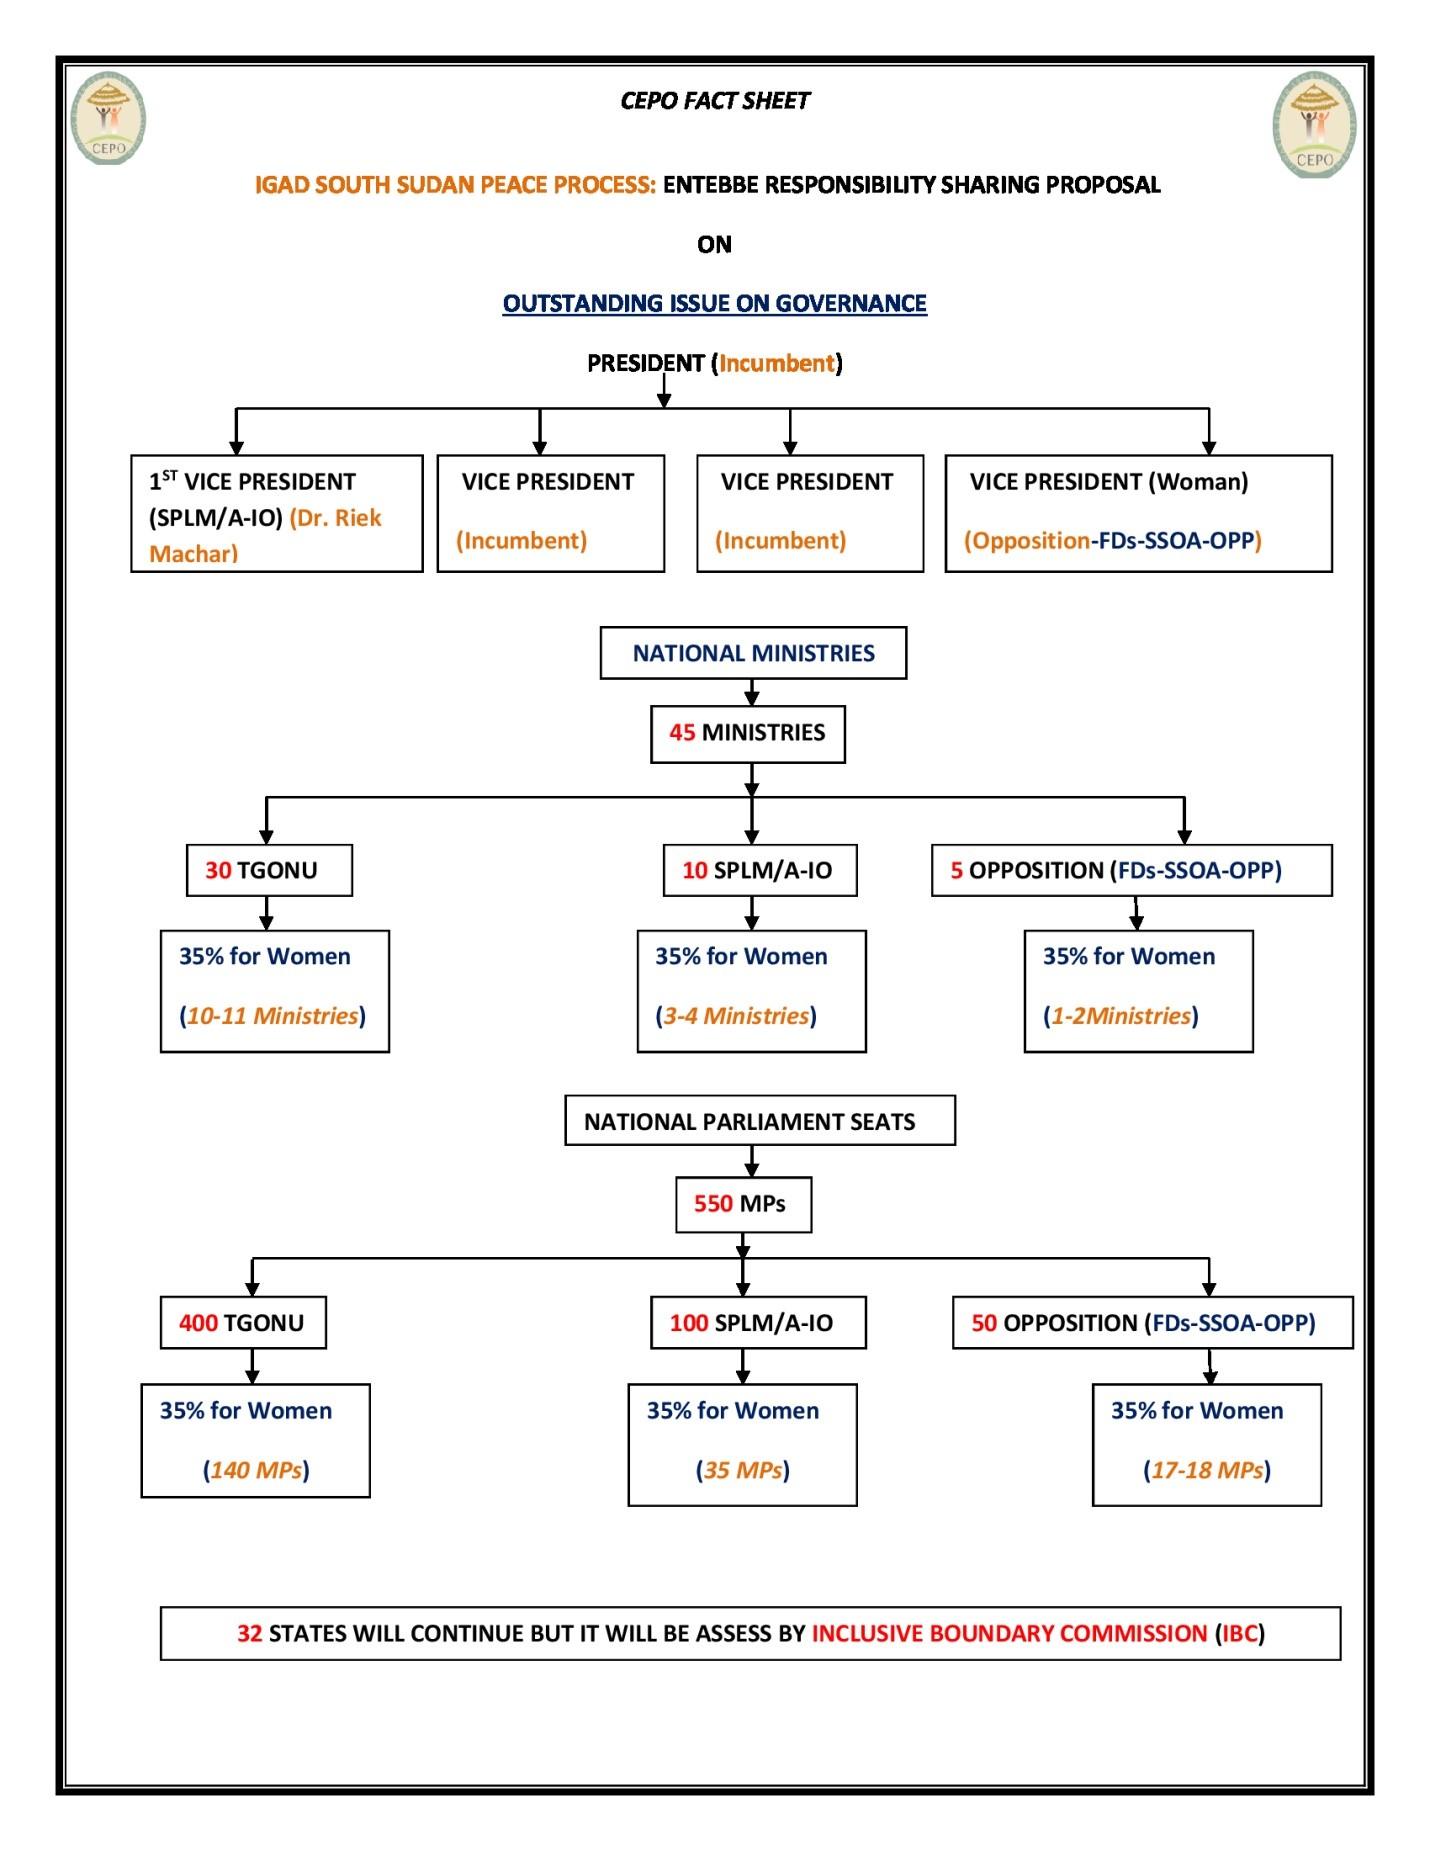 CEPO Fact Sheet - Entebbe proposal